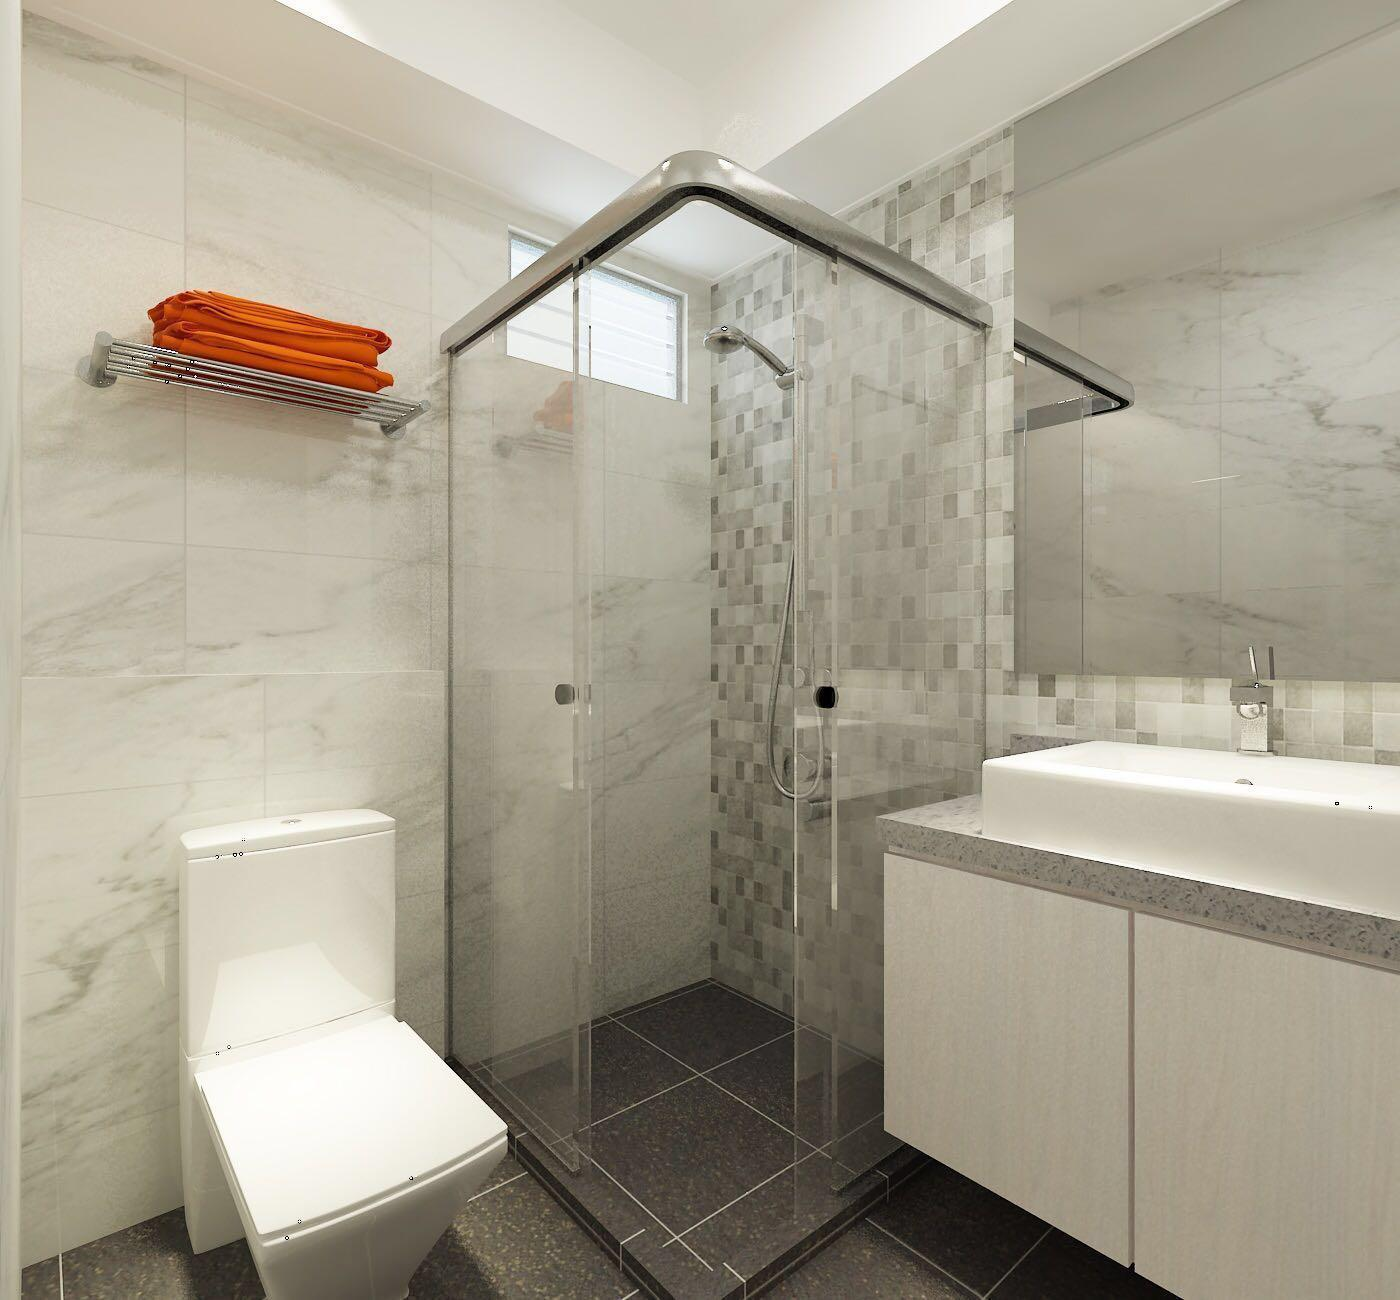 ⭐️Kitchen & Toilets Renovation Package⭐️